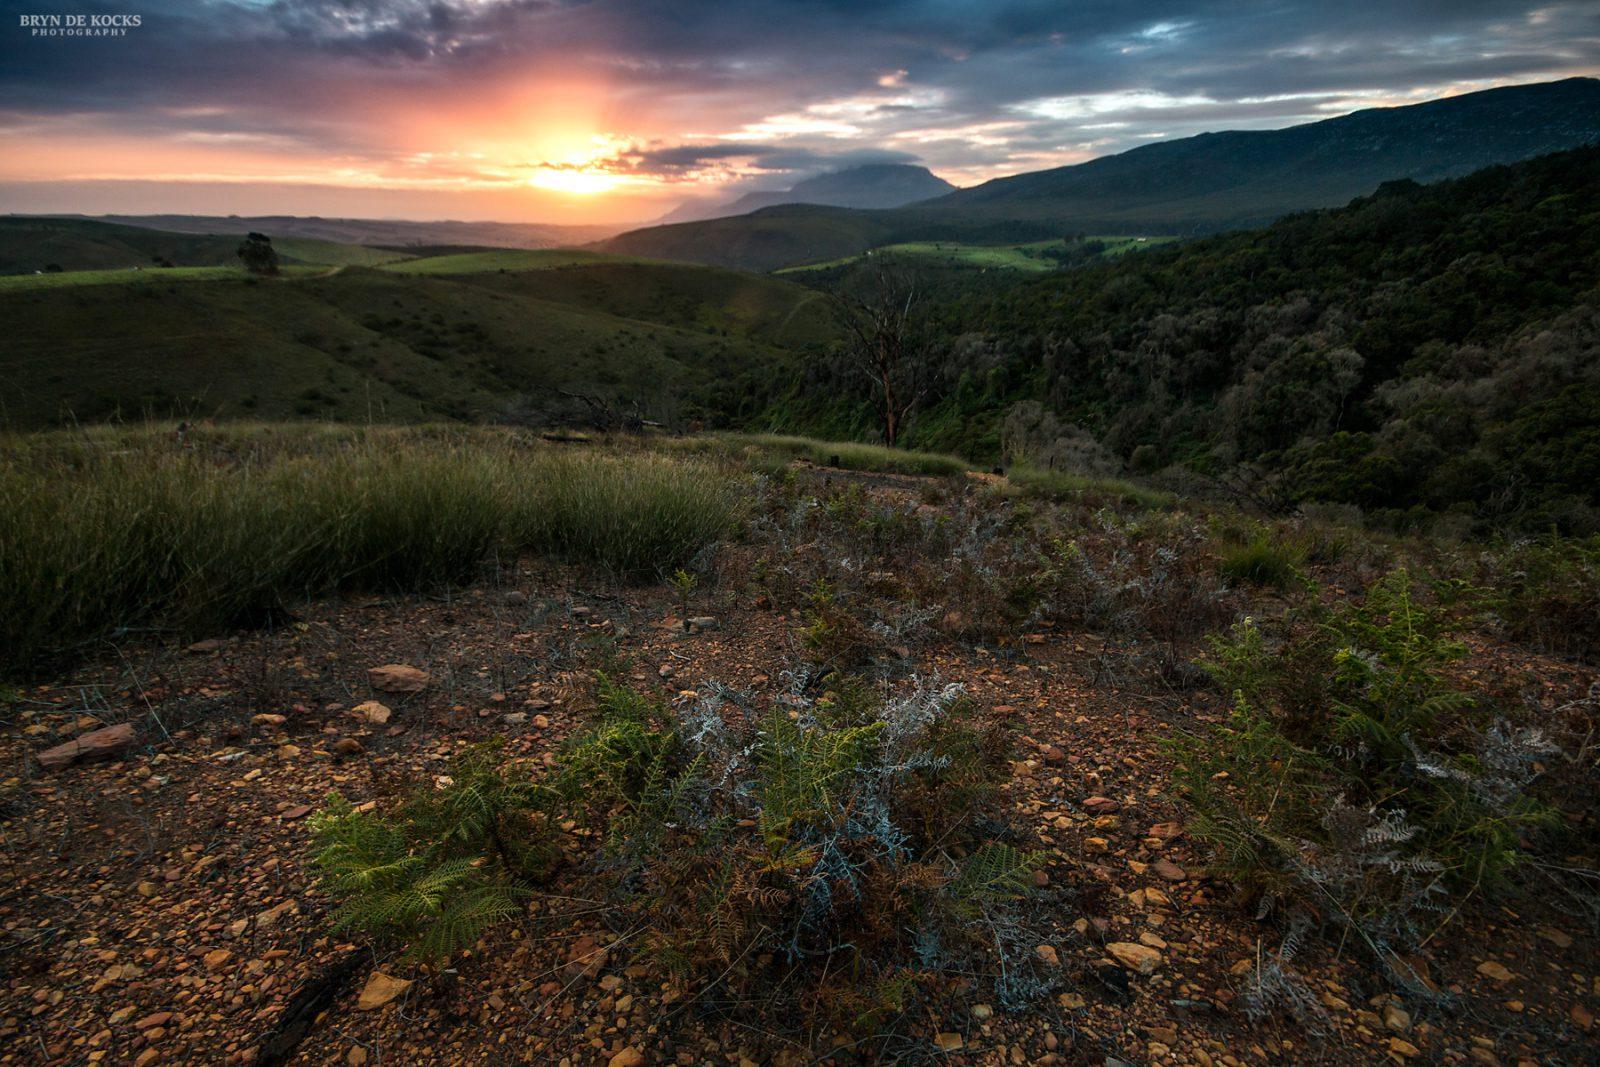 sunset-landscape-grootvadersbosch